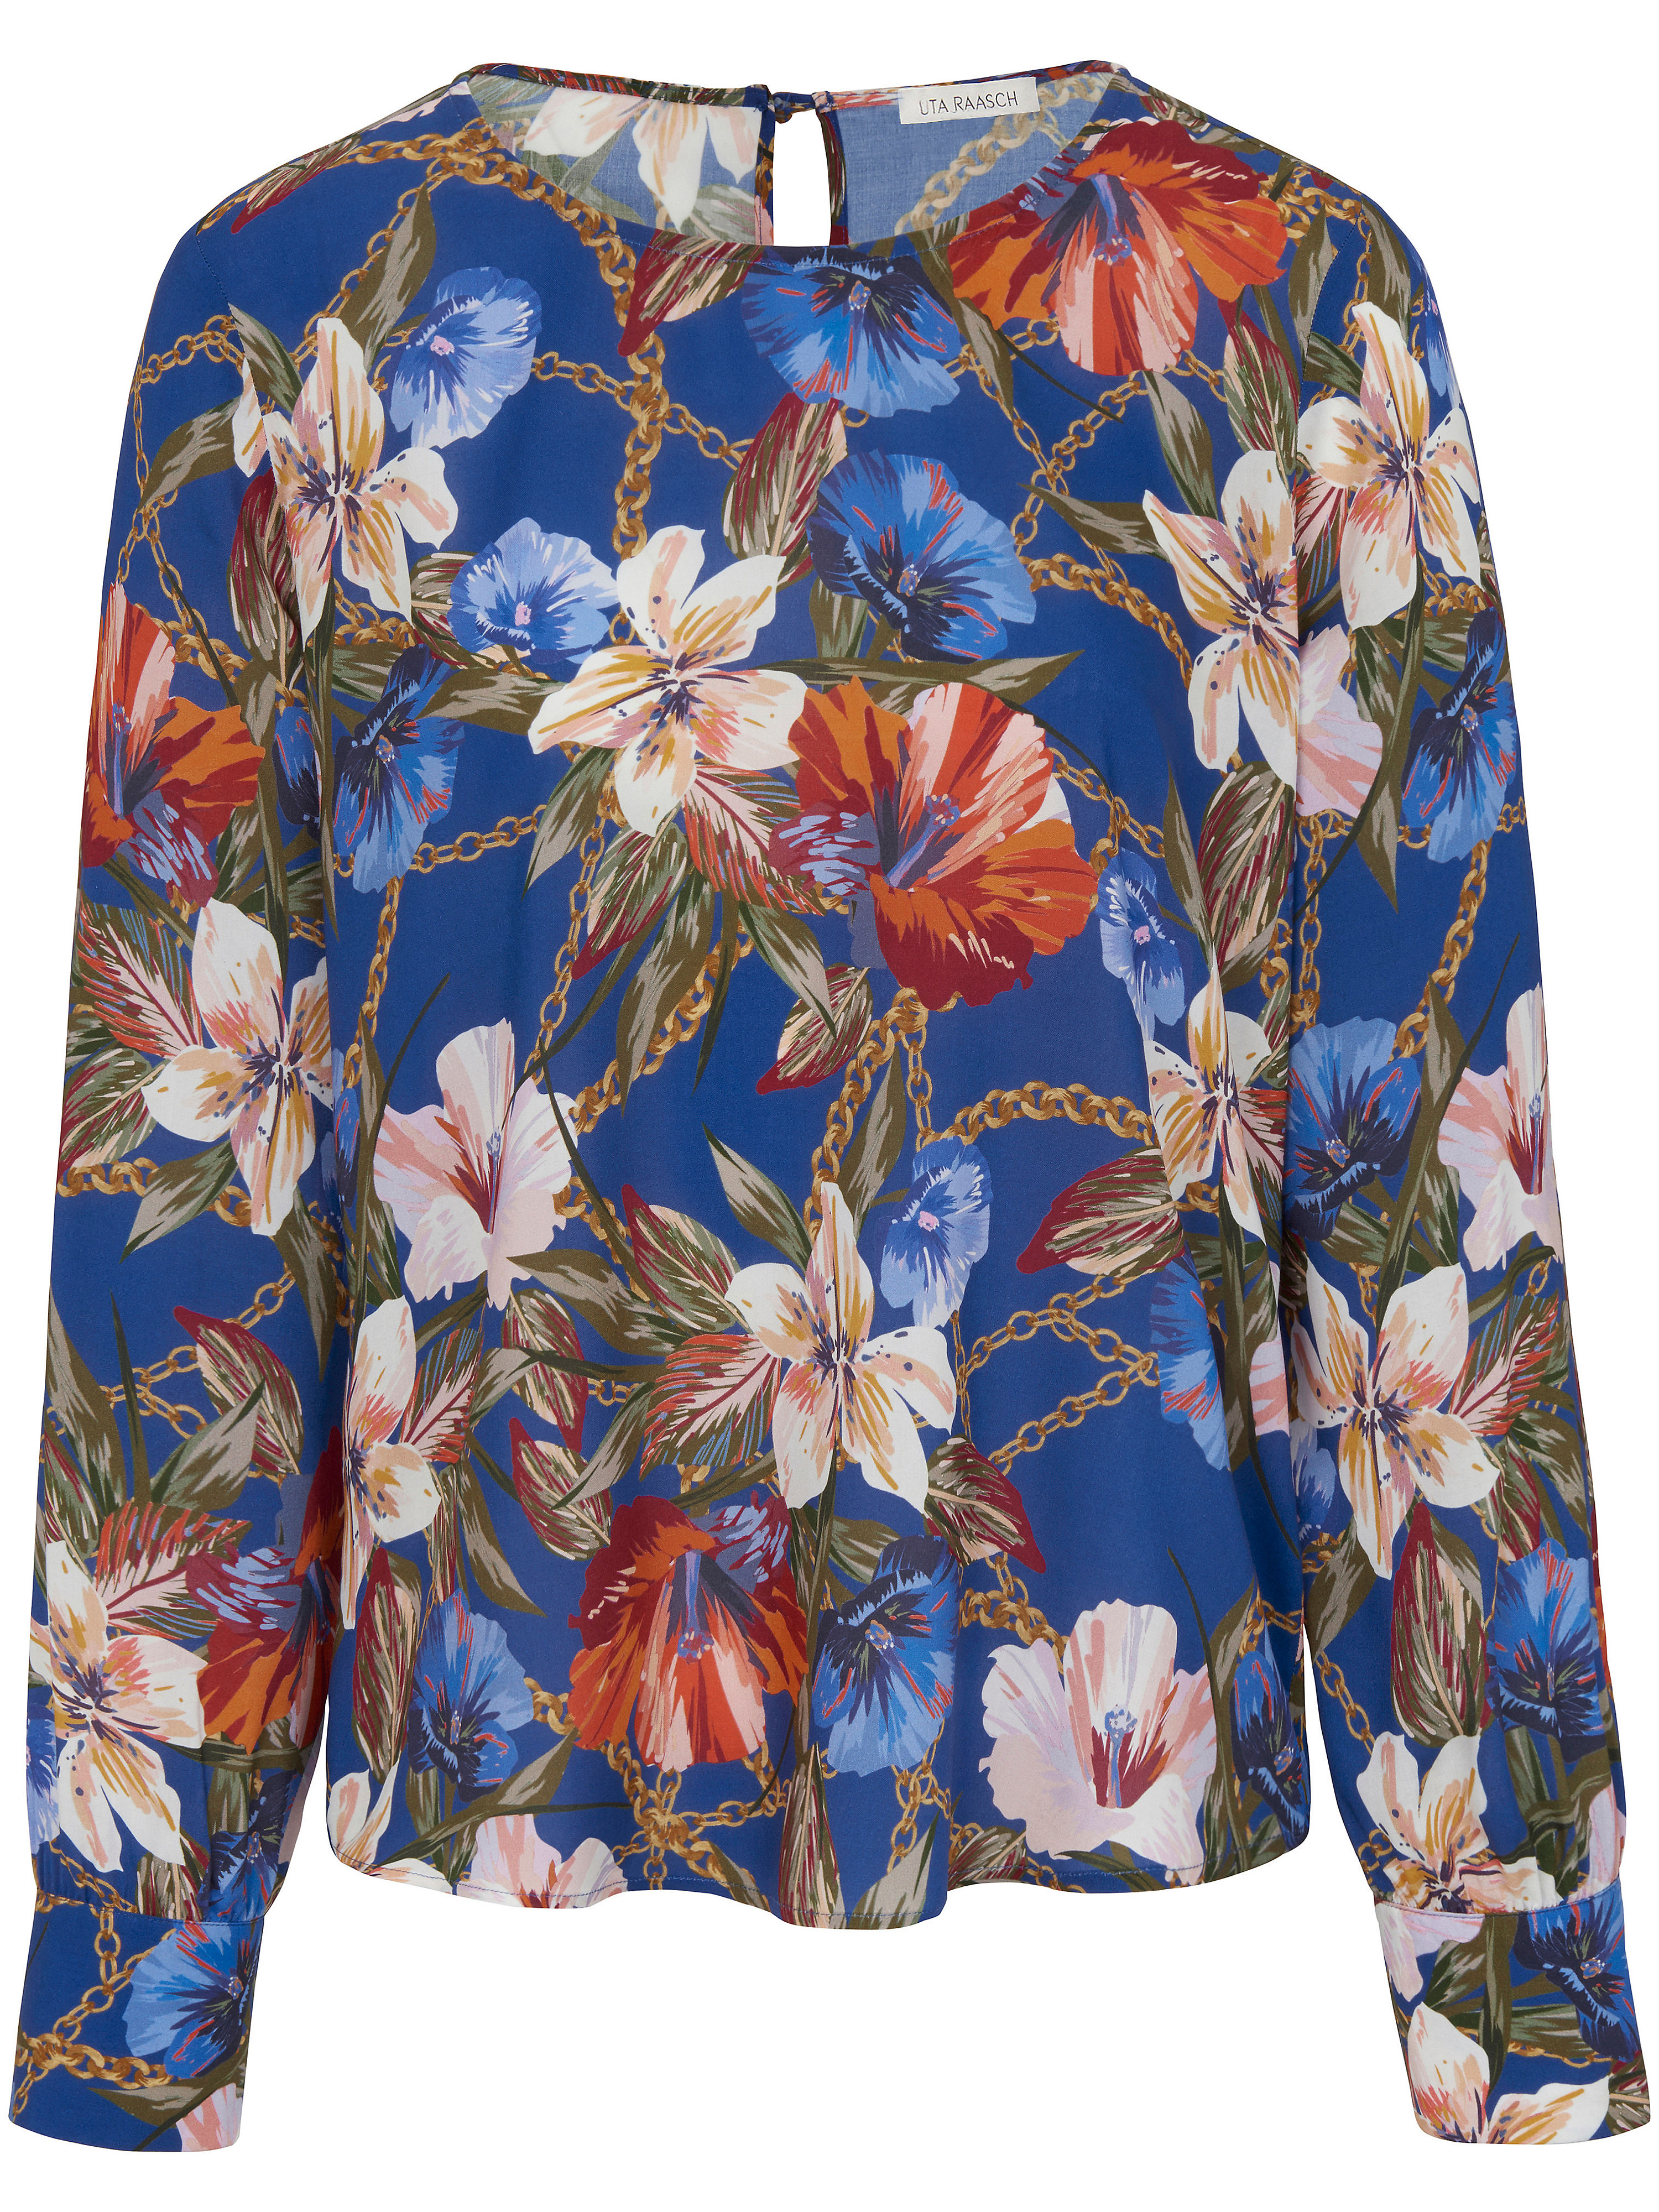 La blouse  Uta Raasch multicolore taille 42